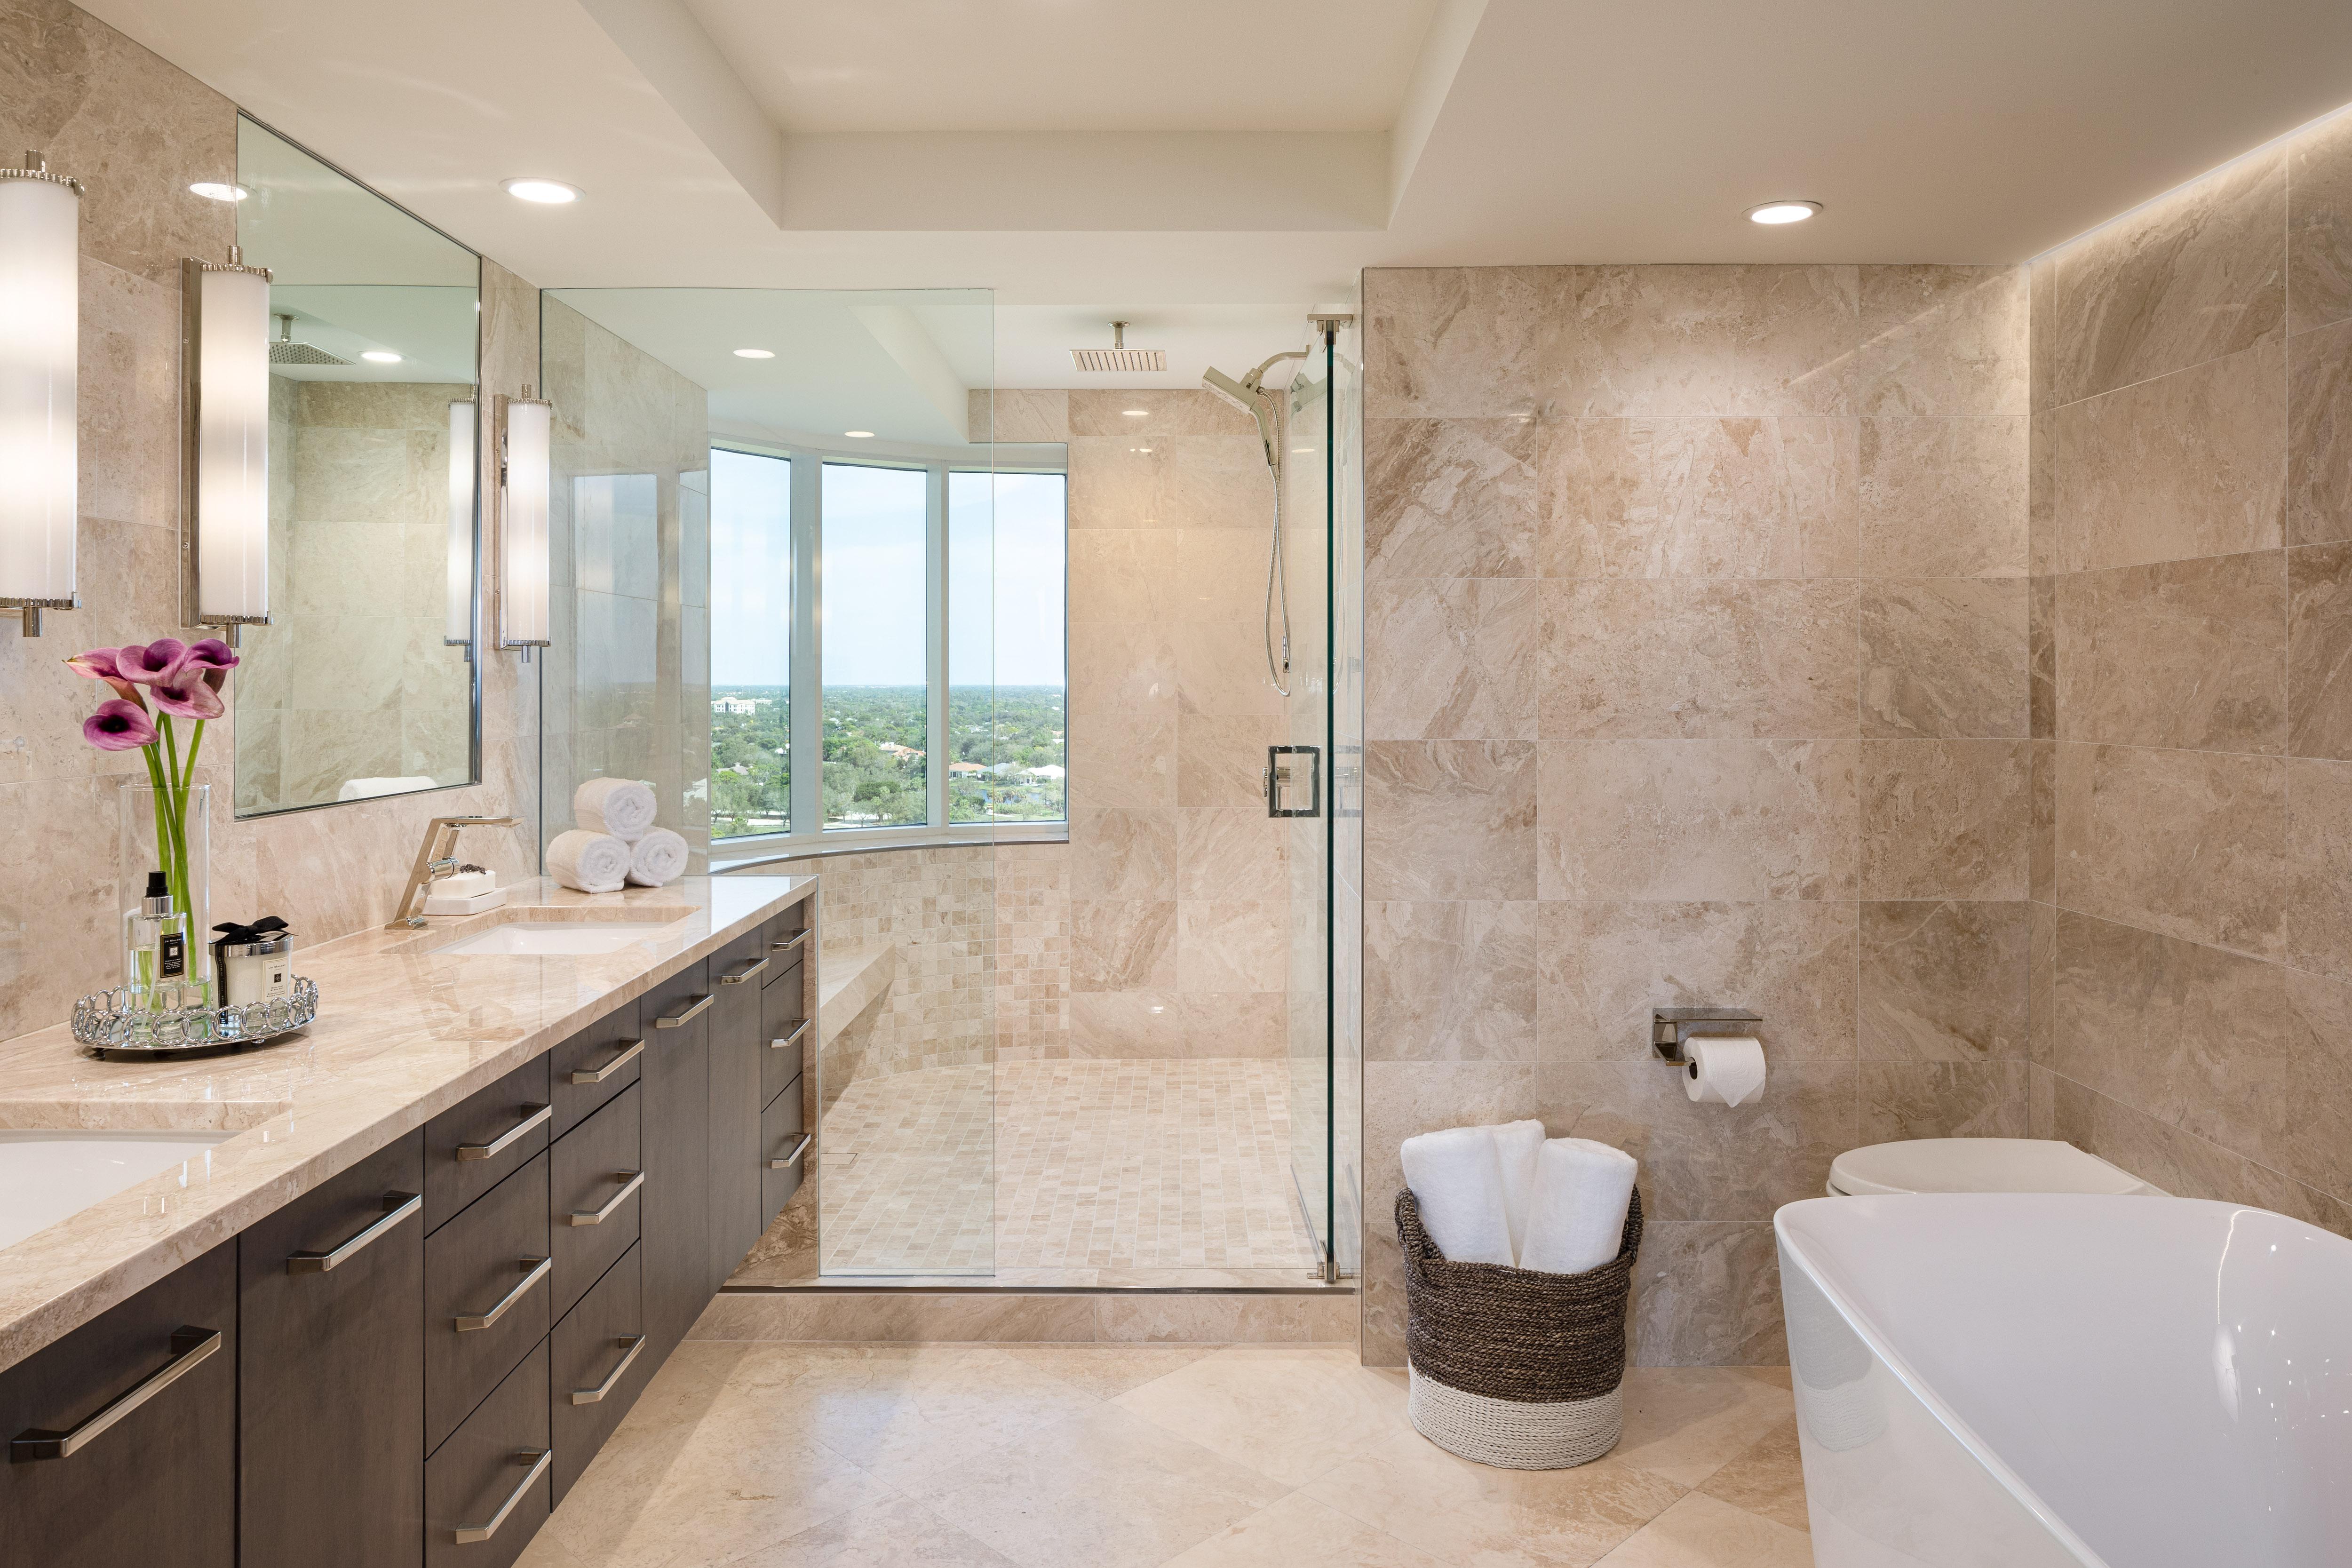 St. Pierre Condo Remodel Master Bath Shower